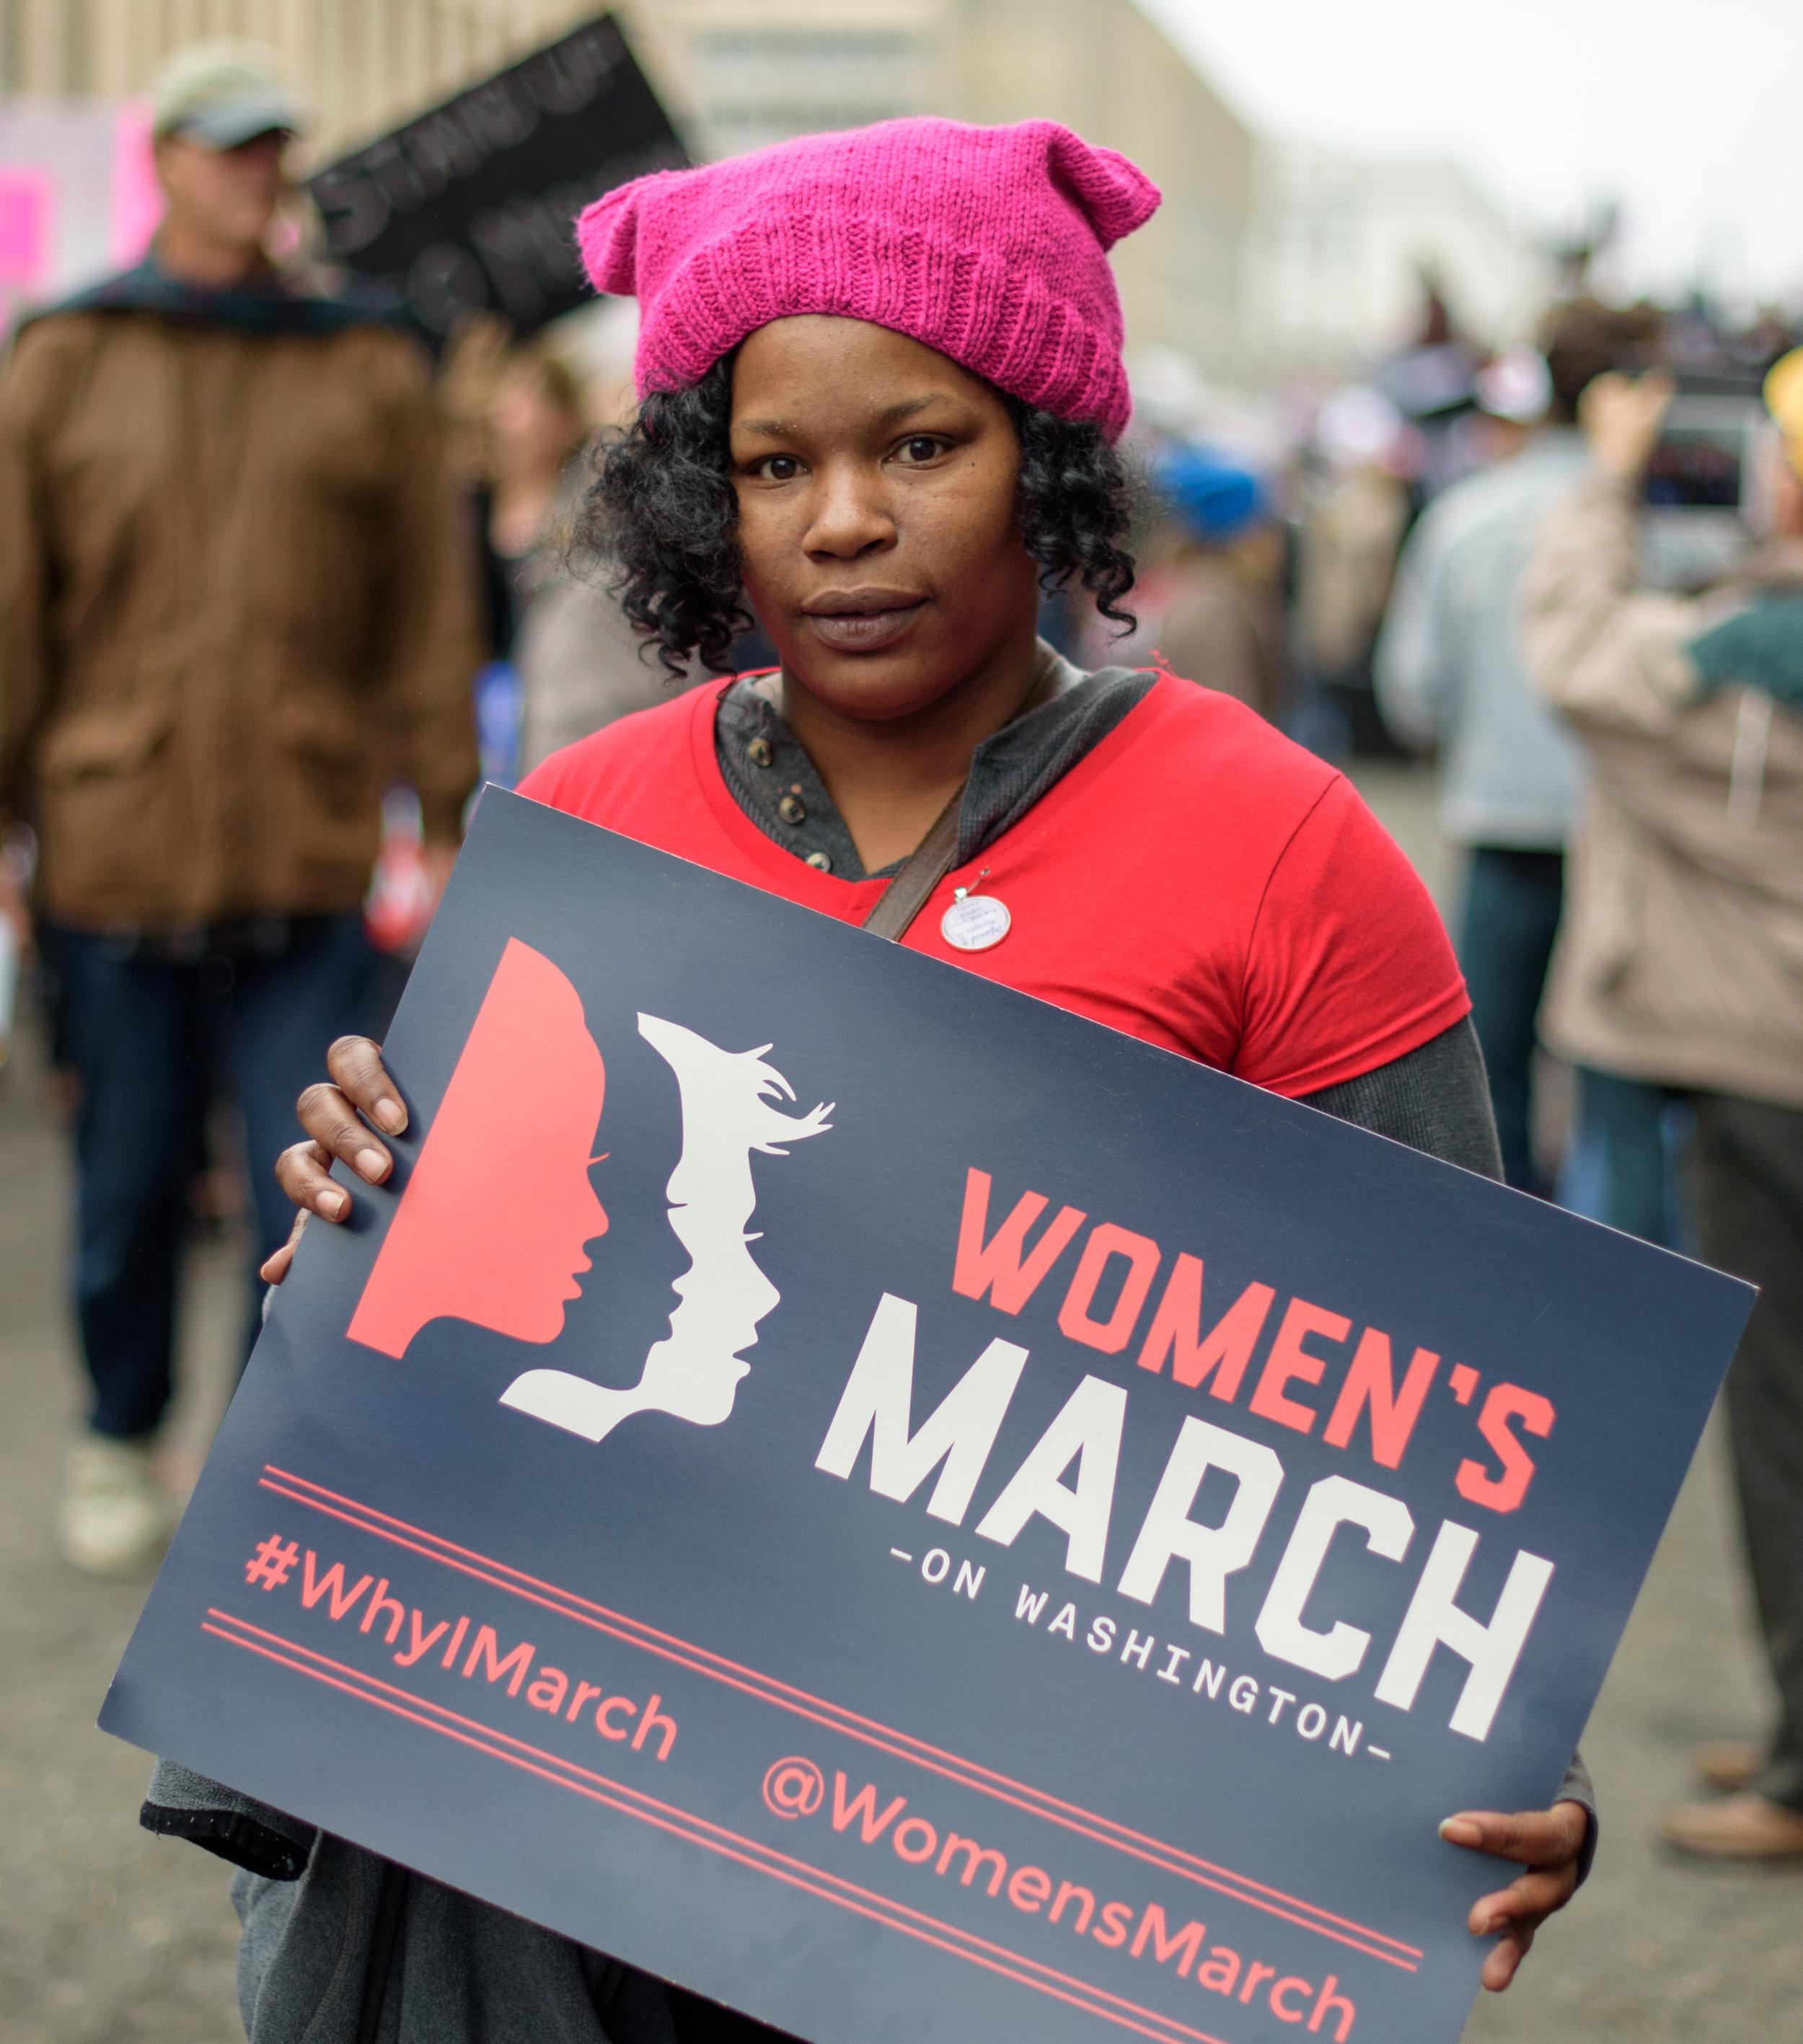 Women's March on Washington [January 21]